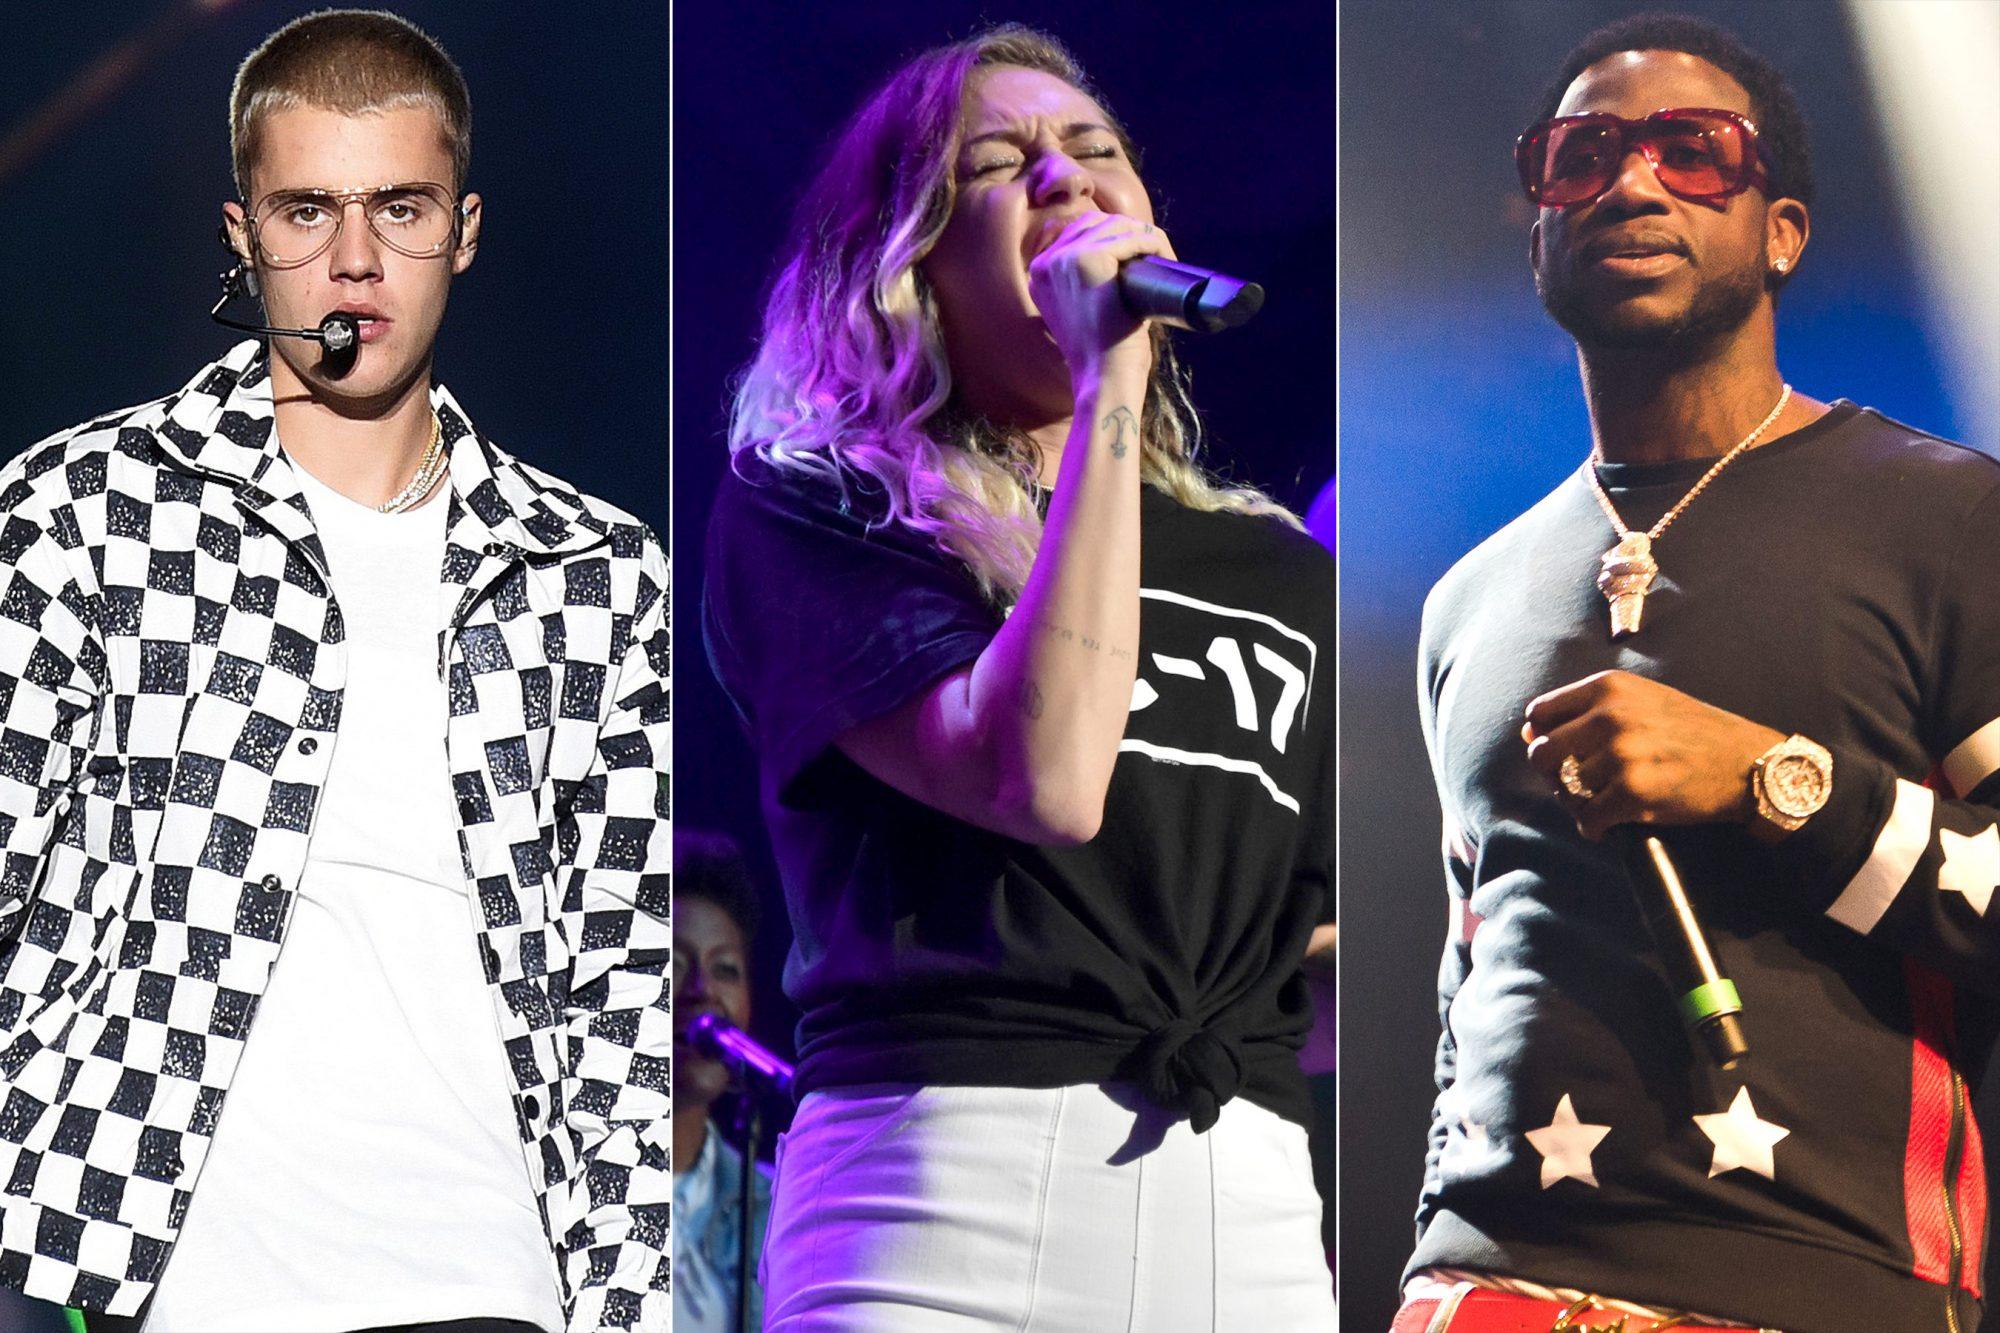 Justin Bieber/ Miley Cyrus/ Gucci Mane